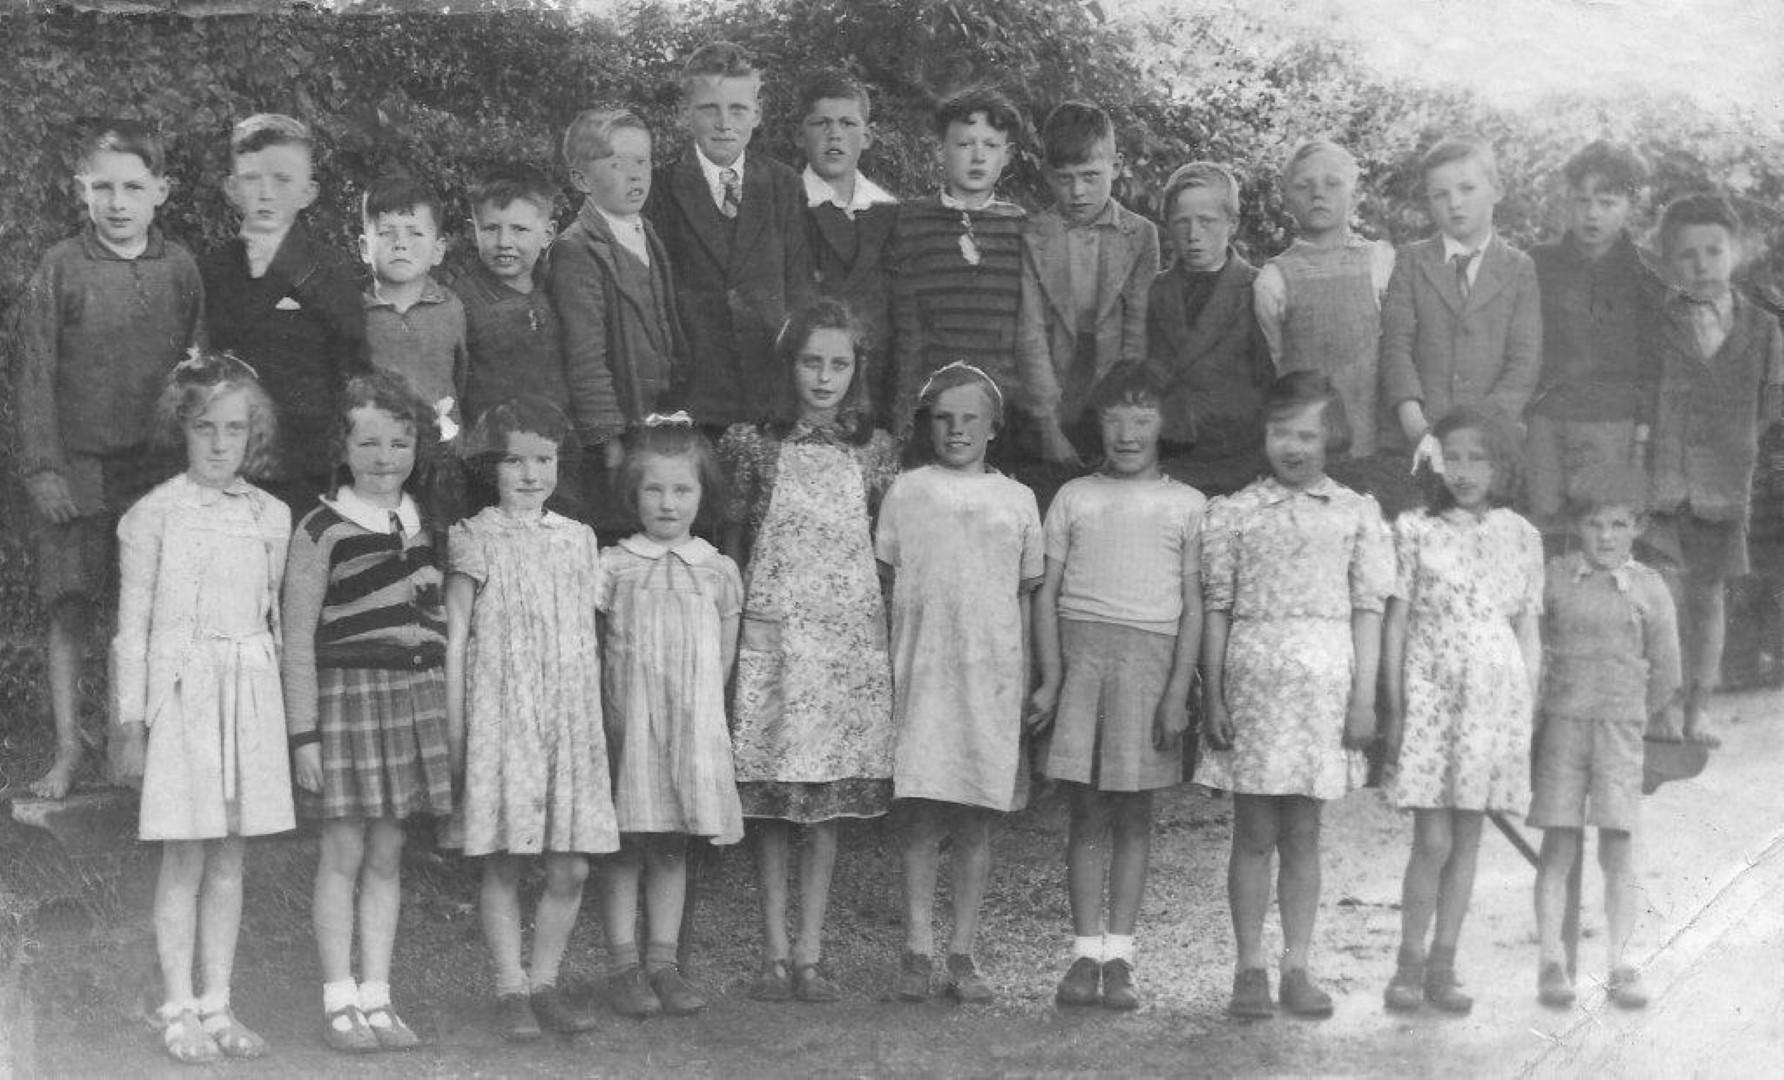 Bannow Historical Society Wexford Calendar 2013 19